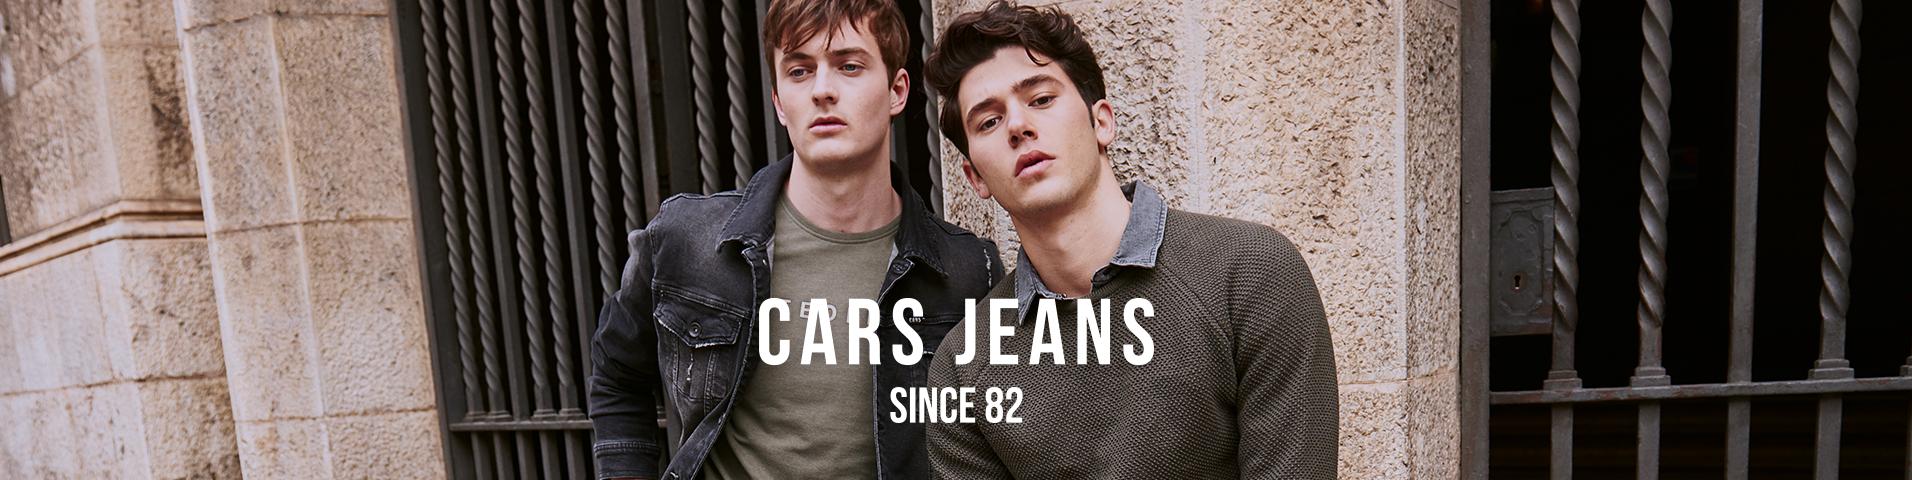 Kleding Inline.Cars Jeans Kleding Online Kopen Gratis Verzending Zalando